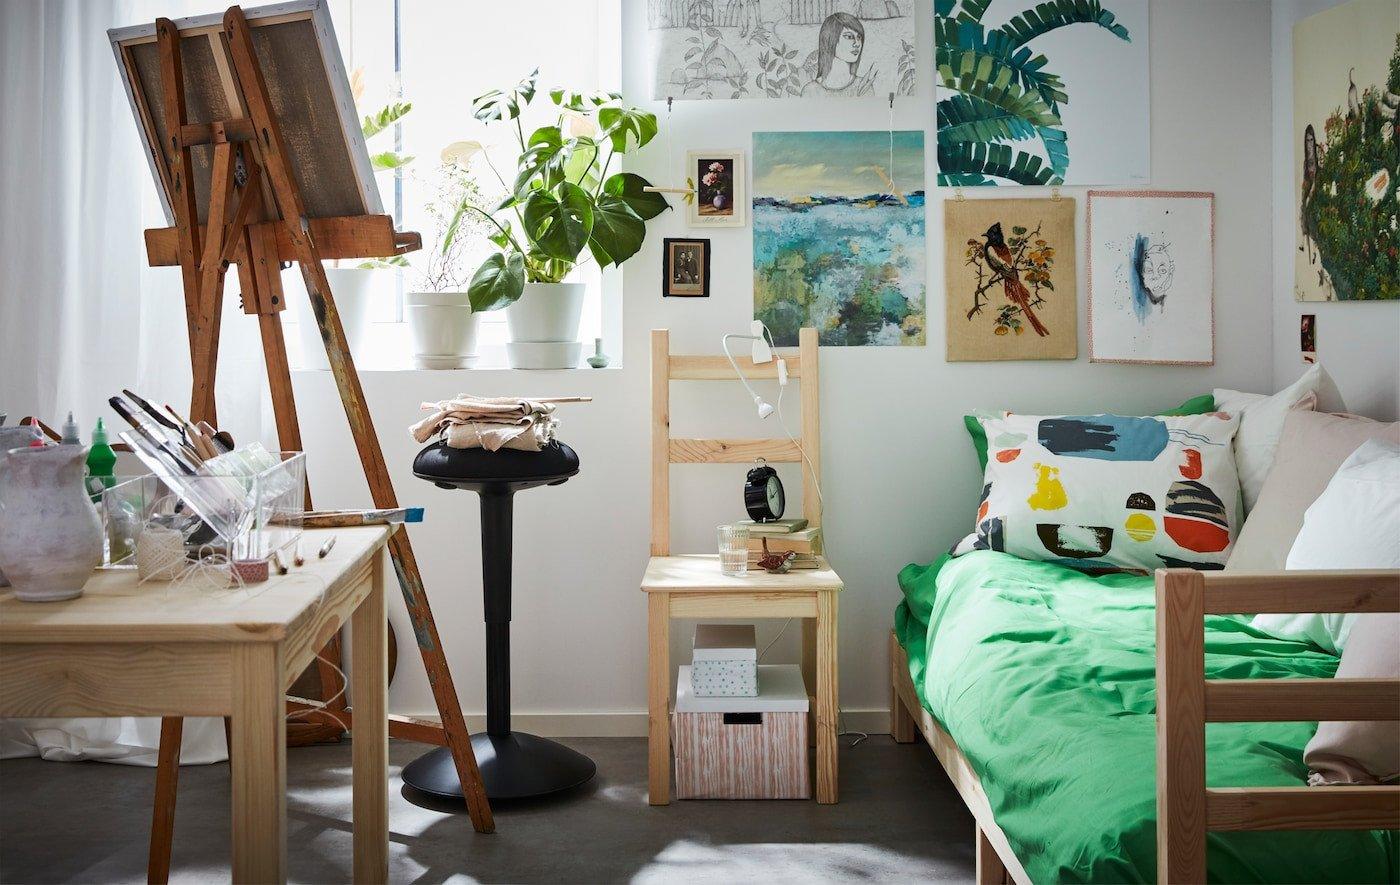 Ikea Bedroom Furniture Set Luxury Creative and Cute Dorm Room Ideas Ikea